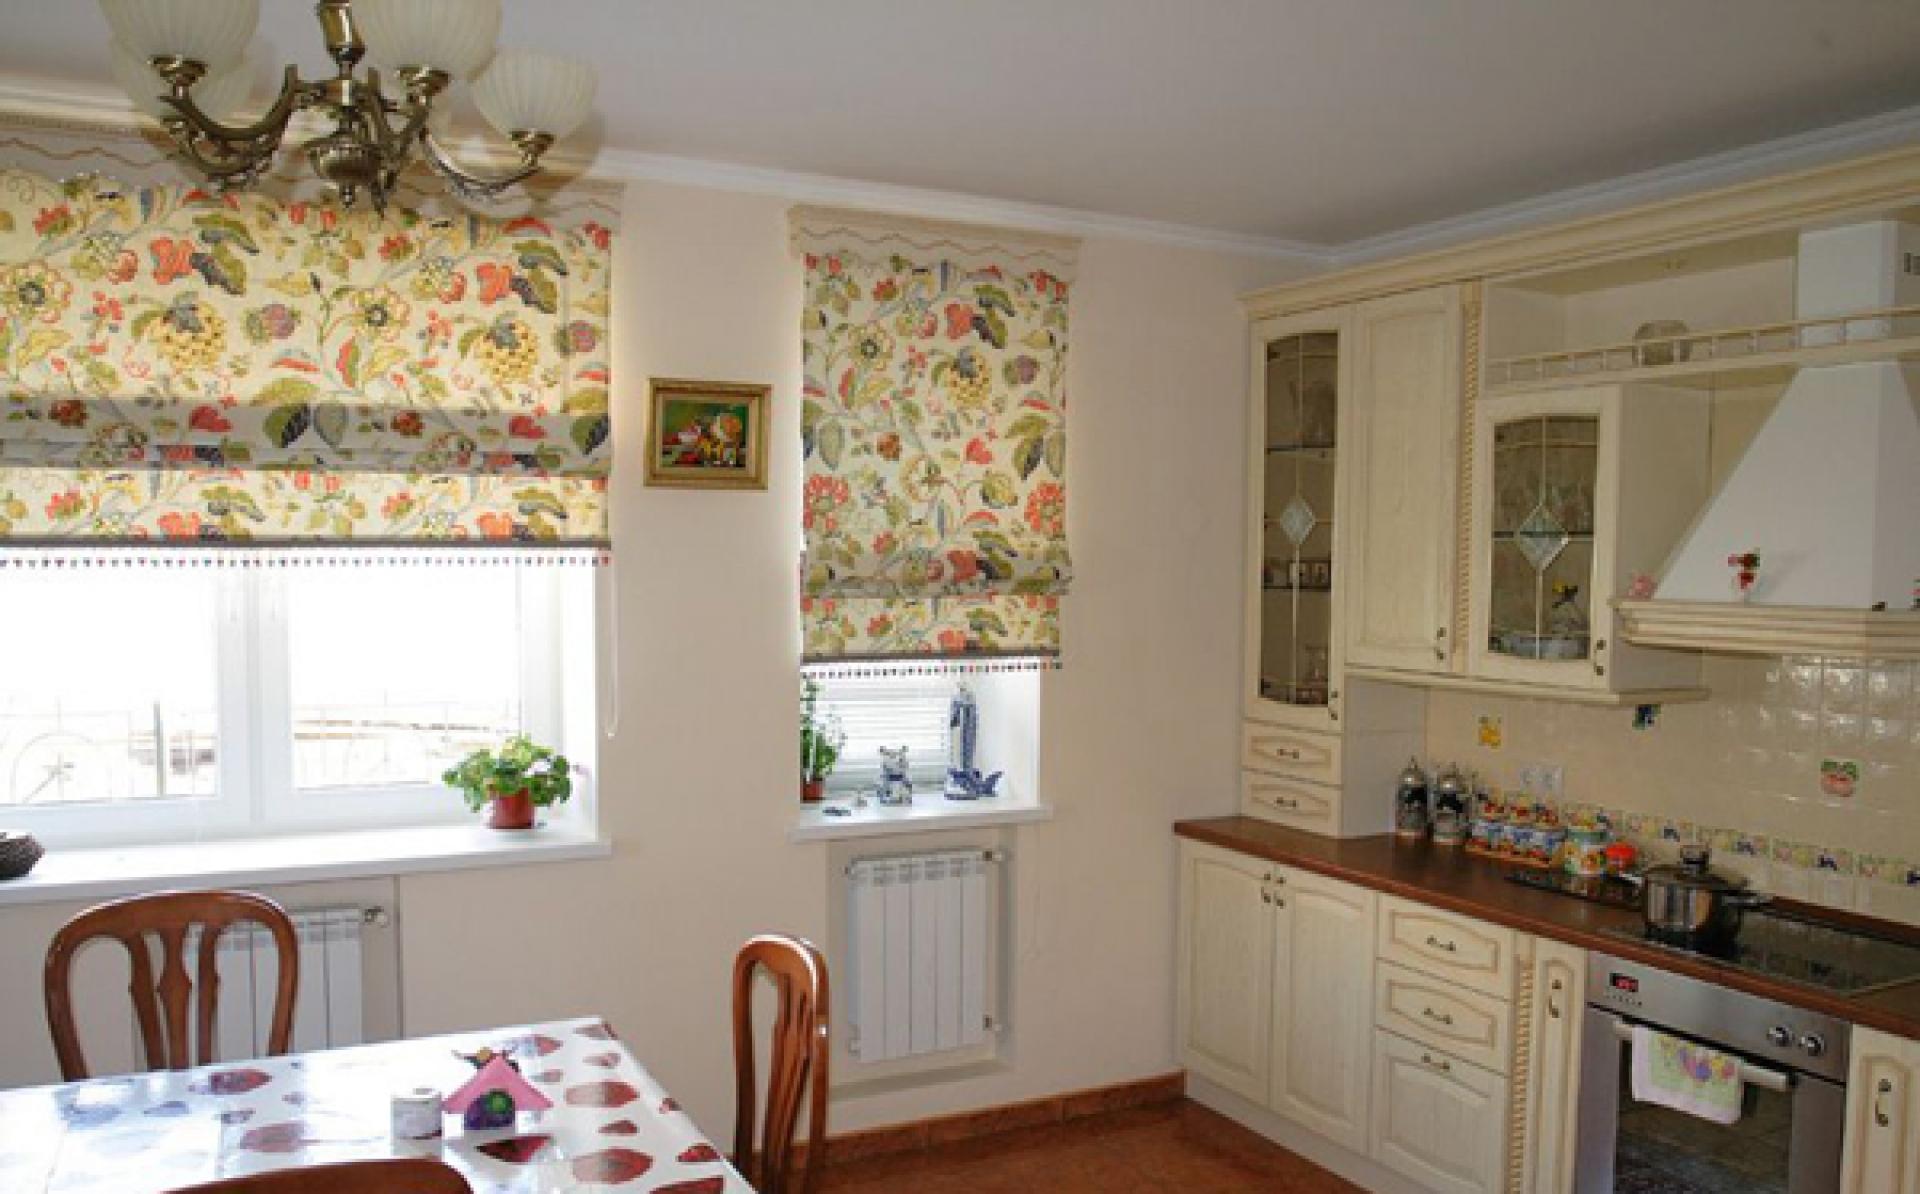 Подоконник – это место, где цветы на кухне не мешают хозяйки и чувствуют себя превосходно.